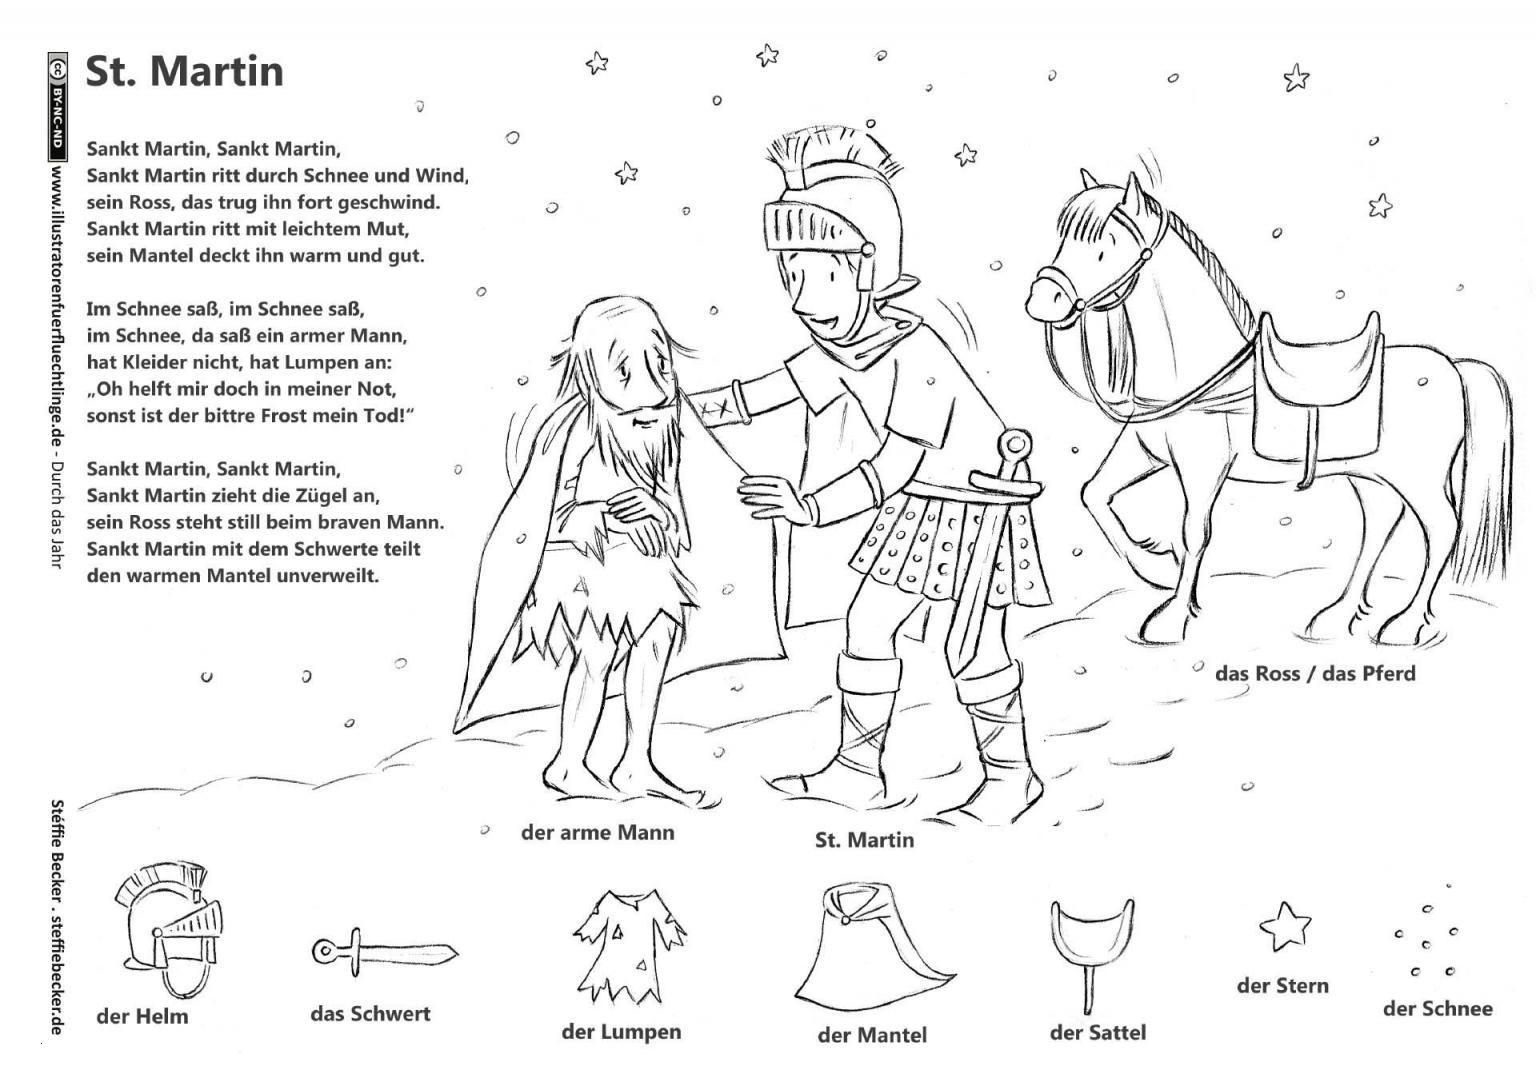 Pippi Langstrumpf Ausmalbild Inspirierend Bayern Ausmalbilder Schön Igel Grundschule 0d Archives Neu Bild